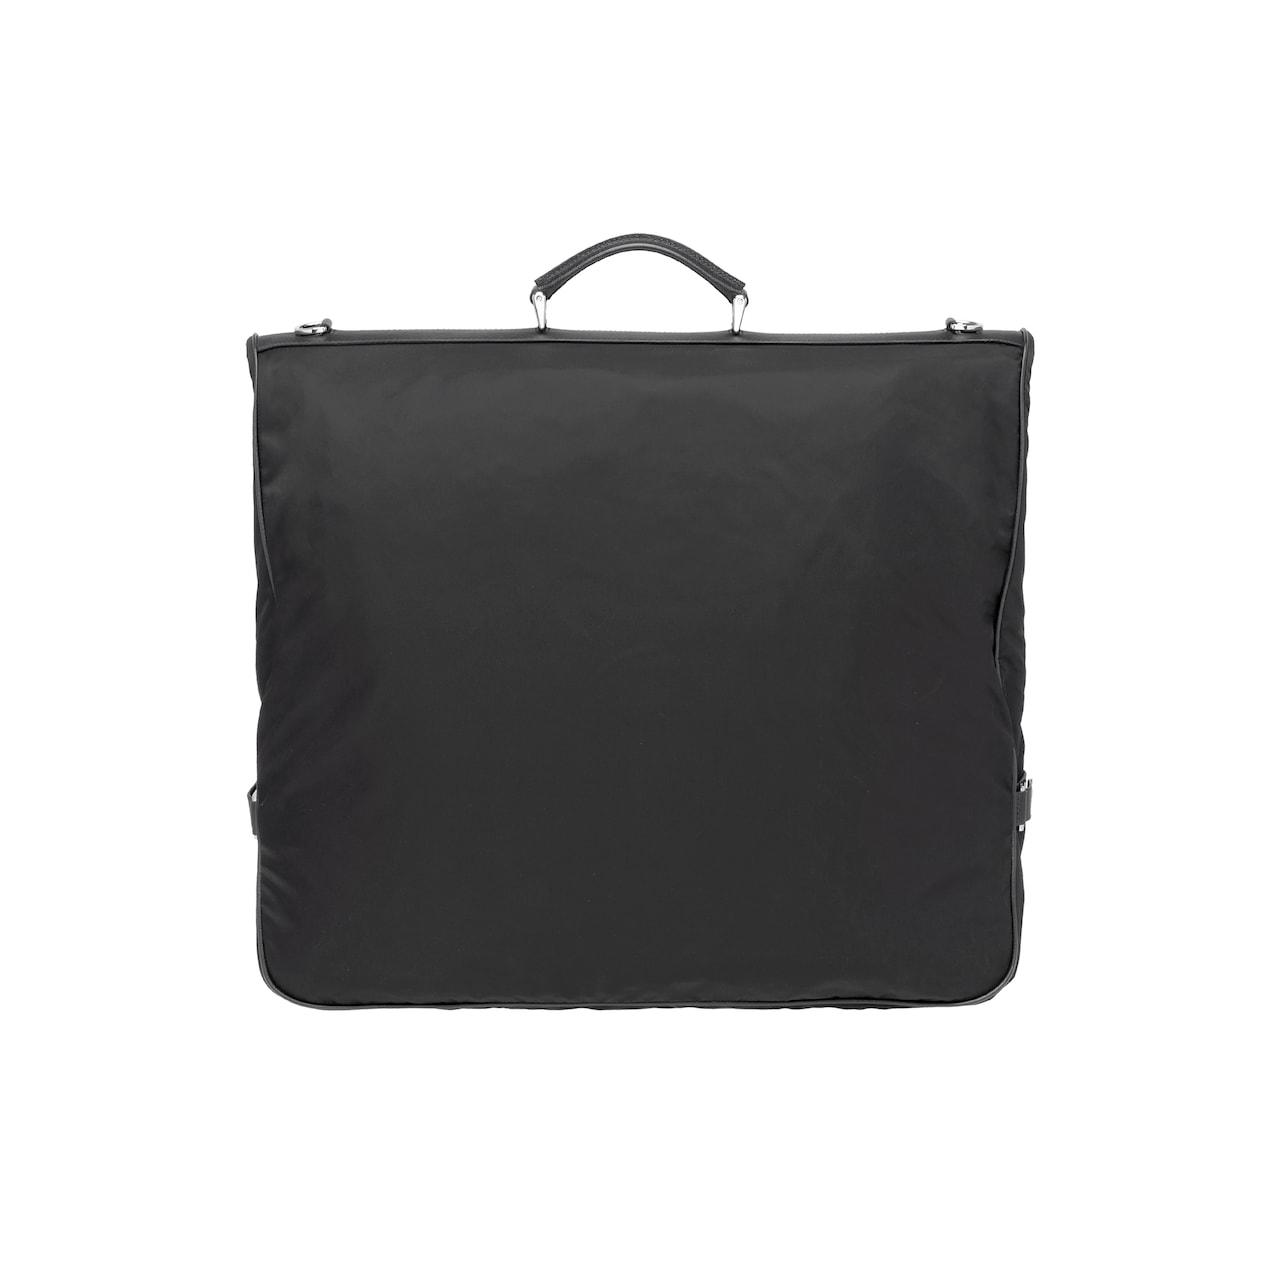 Prada Saffiano leather and nylon garment bag 4